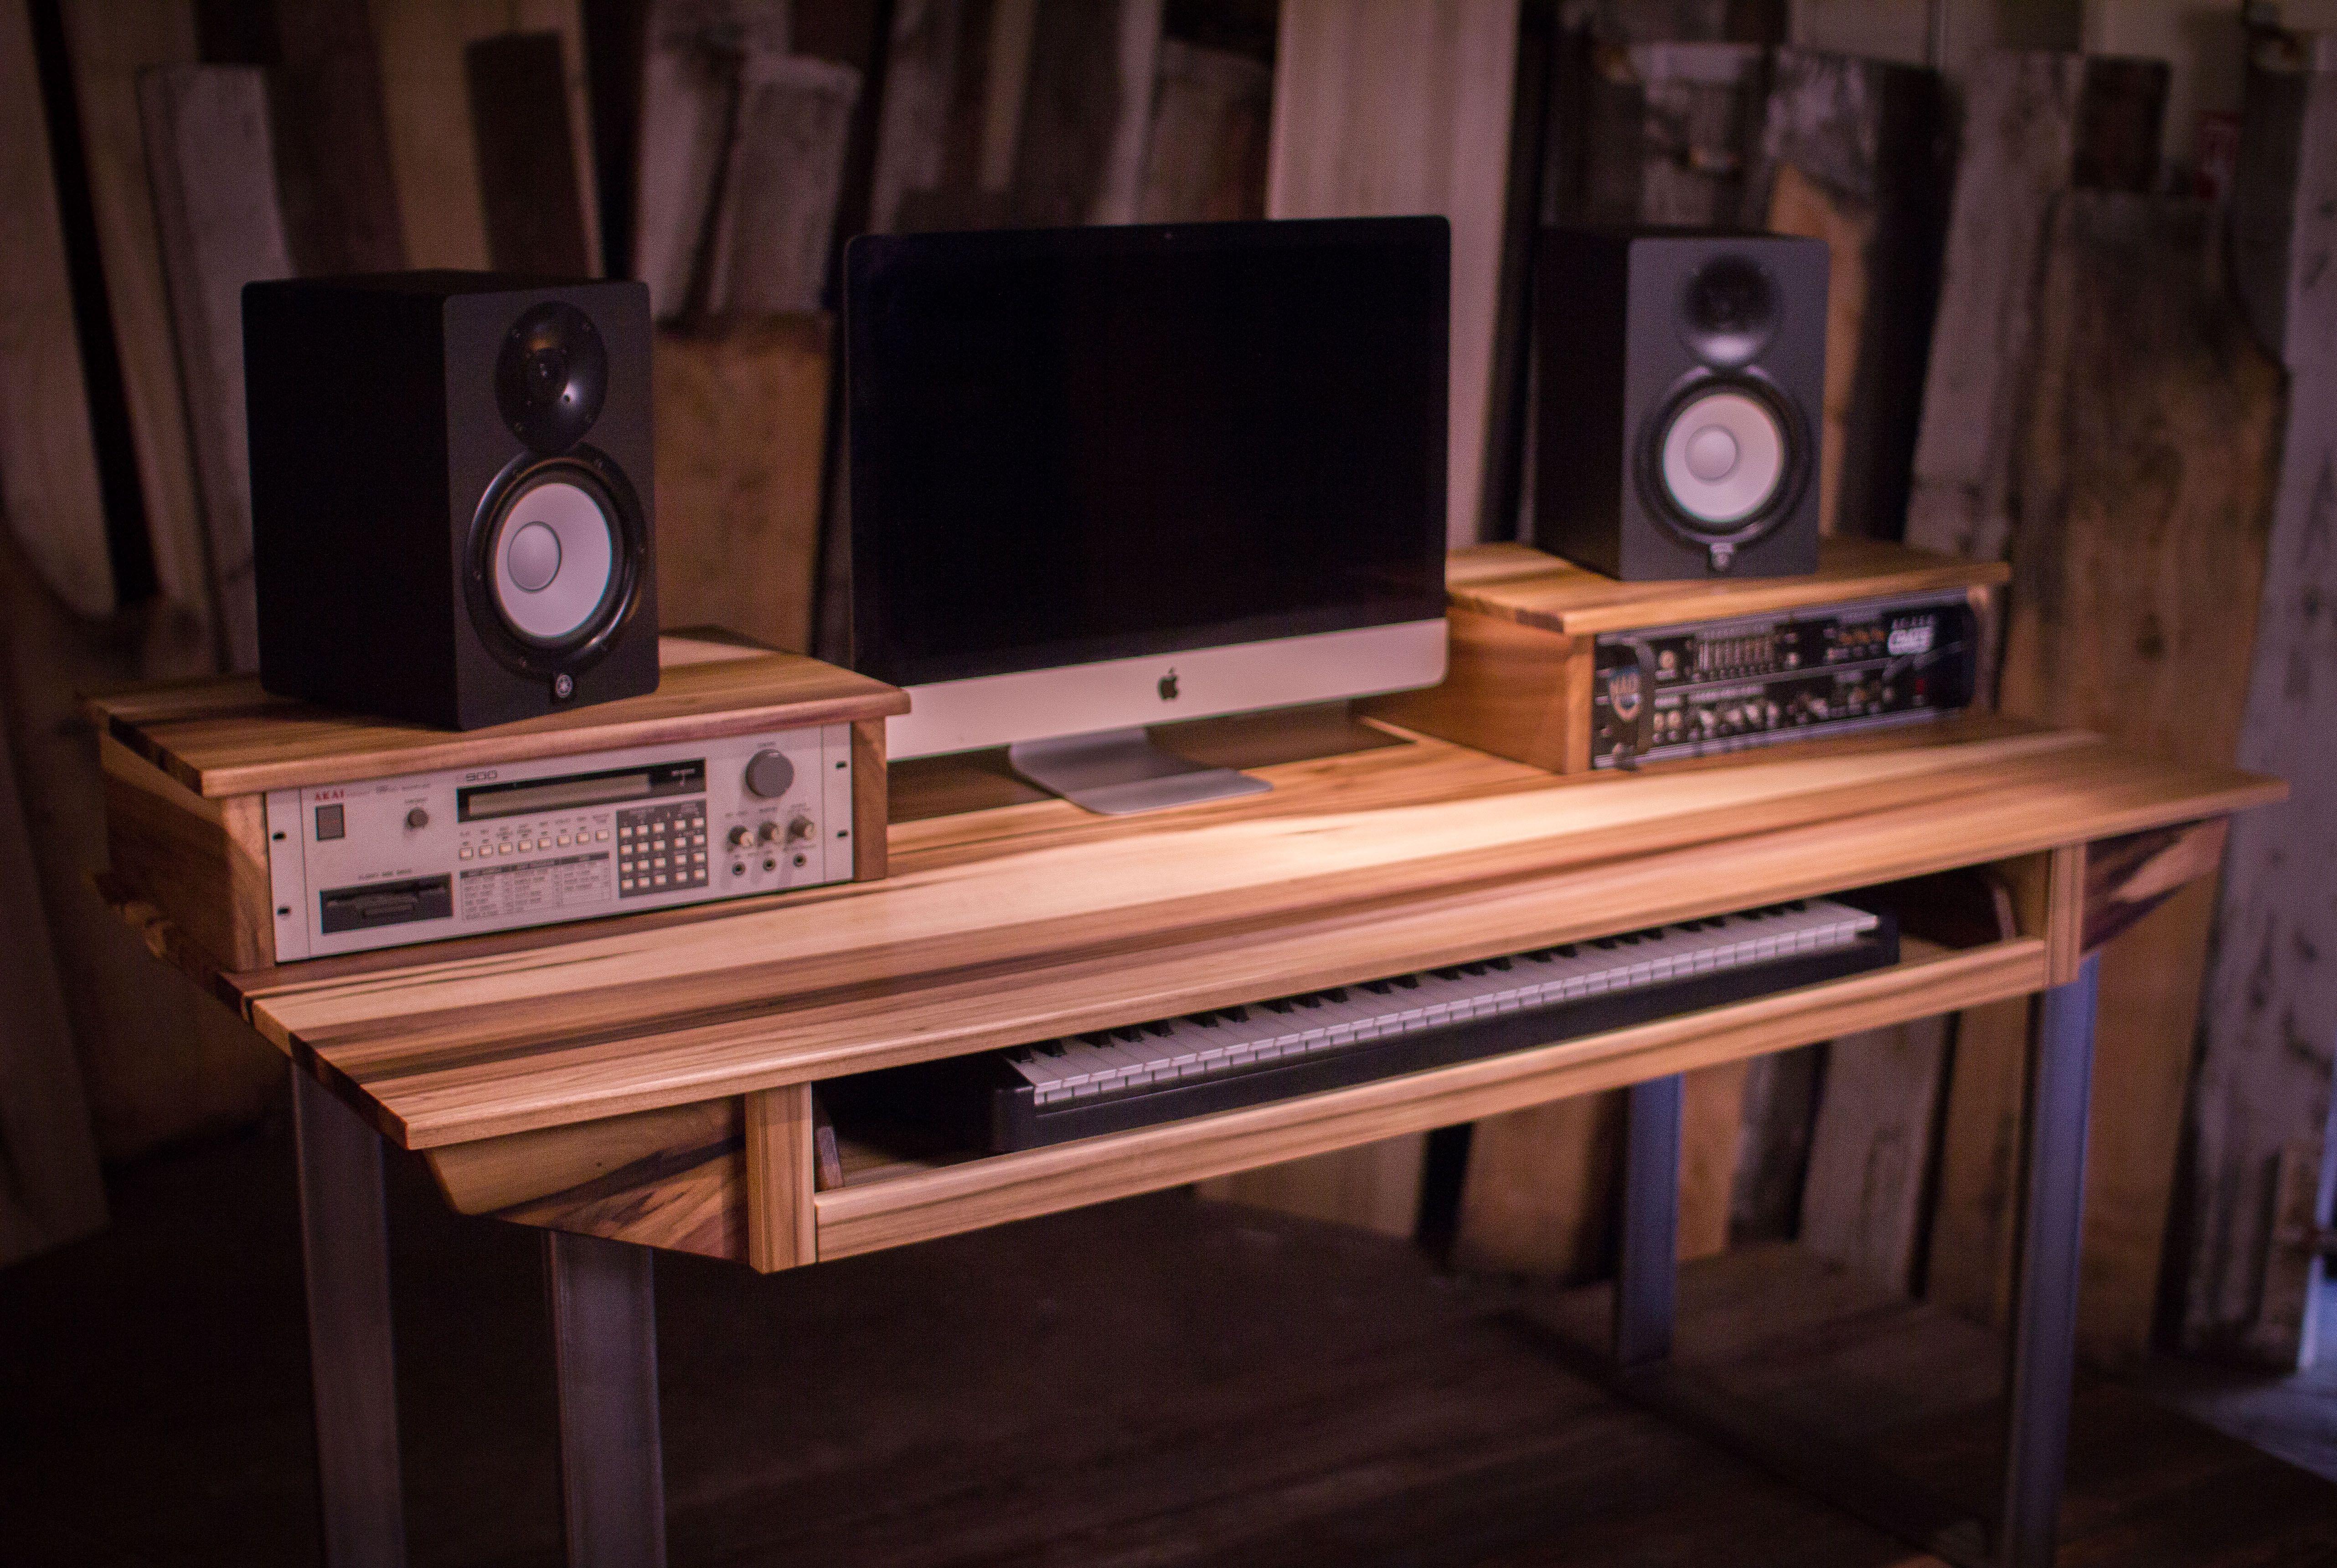 Custom Made Studio Desk For Audio Video Production W Keyboard Workstation Shelf And Rack Units Studio Desk Recording Studio Design Recording Studio Desk